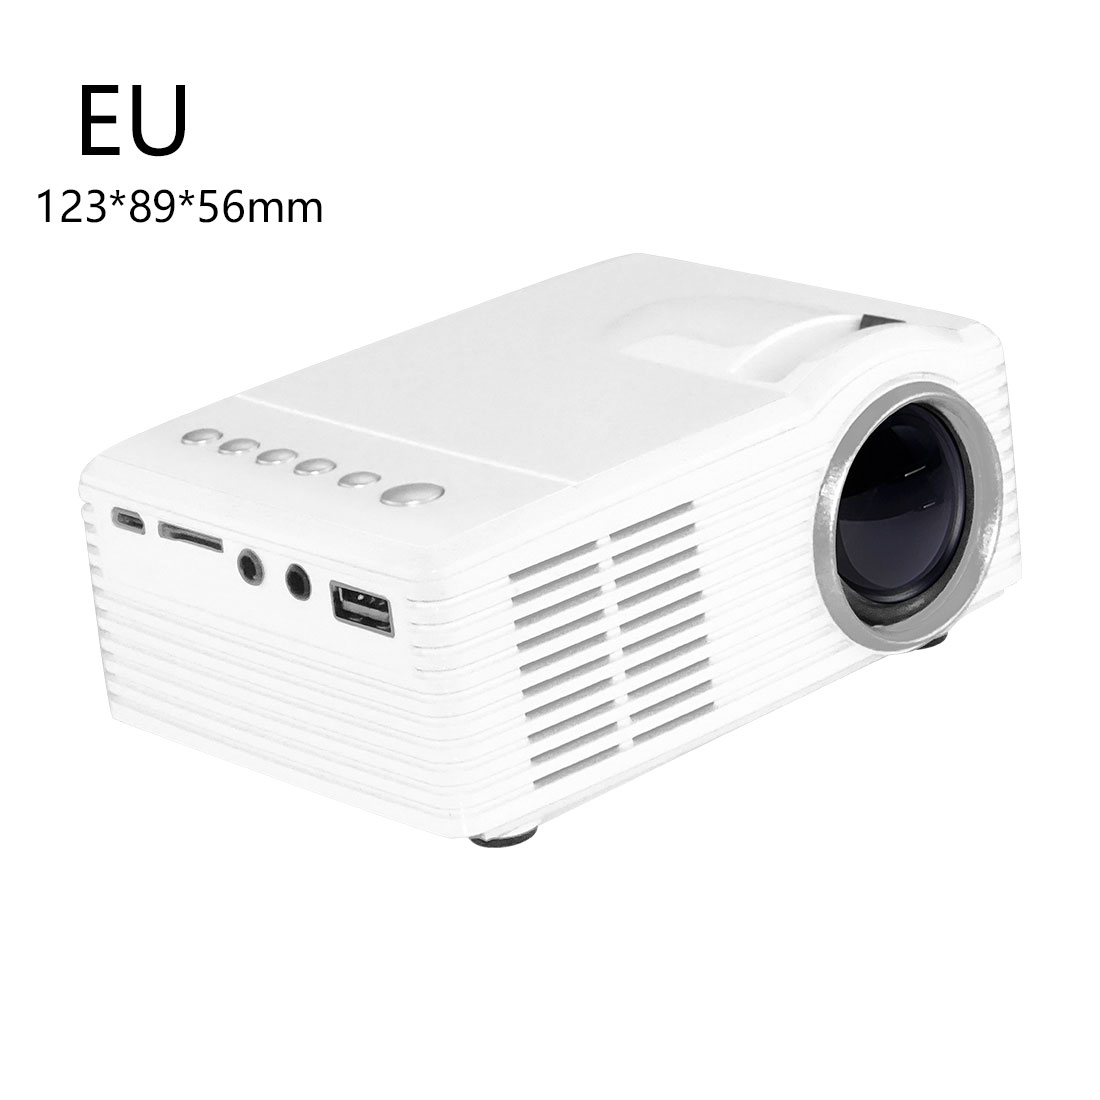 centechia New EU Plug MG300 Portable LCD Projector 3.5mm Audio 320x240 Pixel HDMI USB Mini MG300 Projector Home Media Player